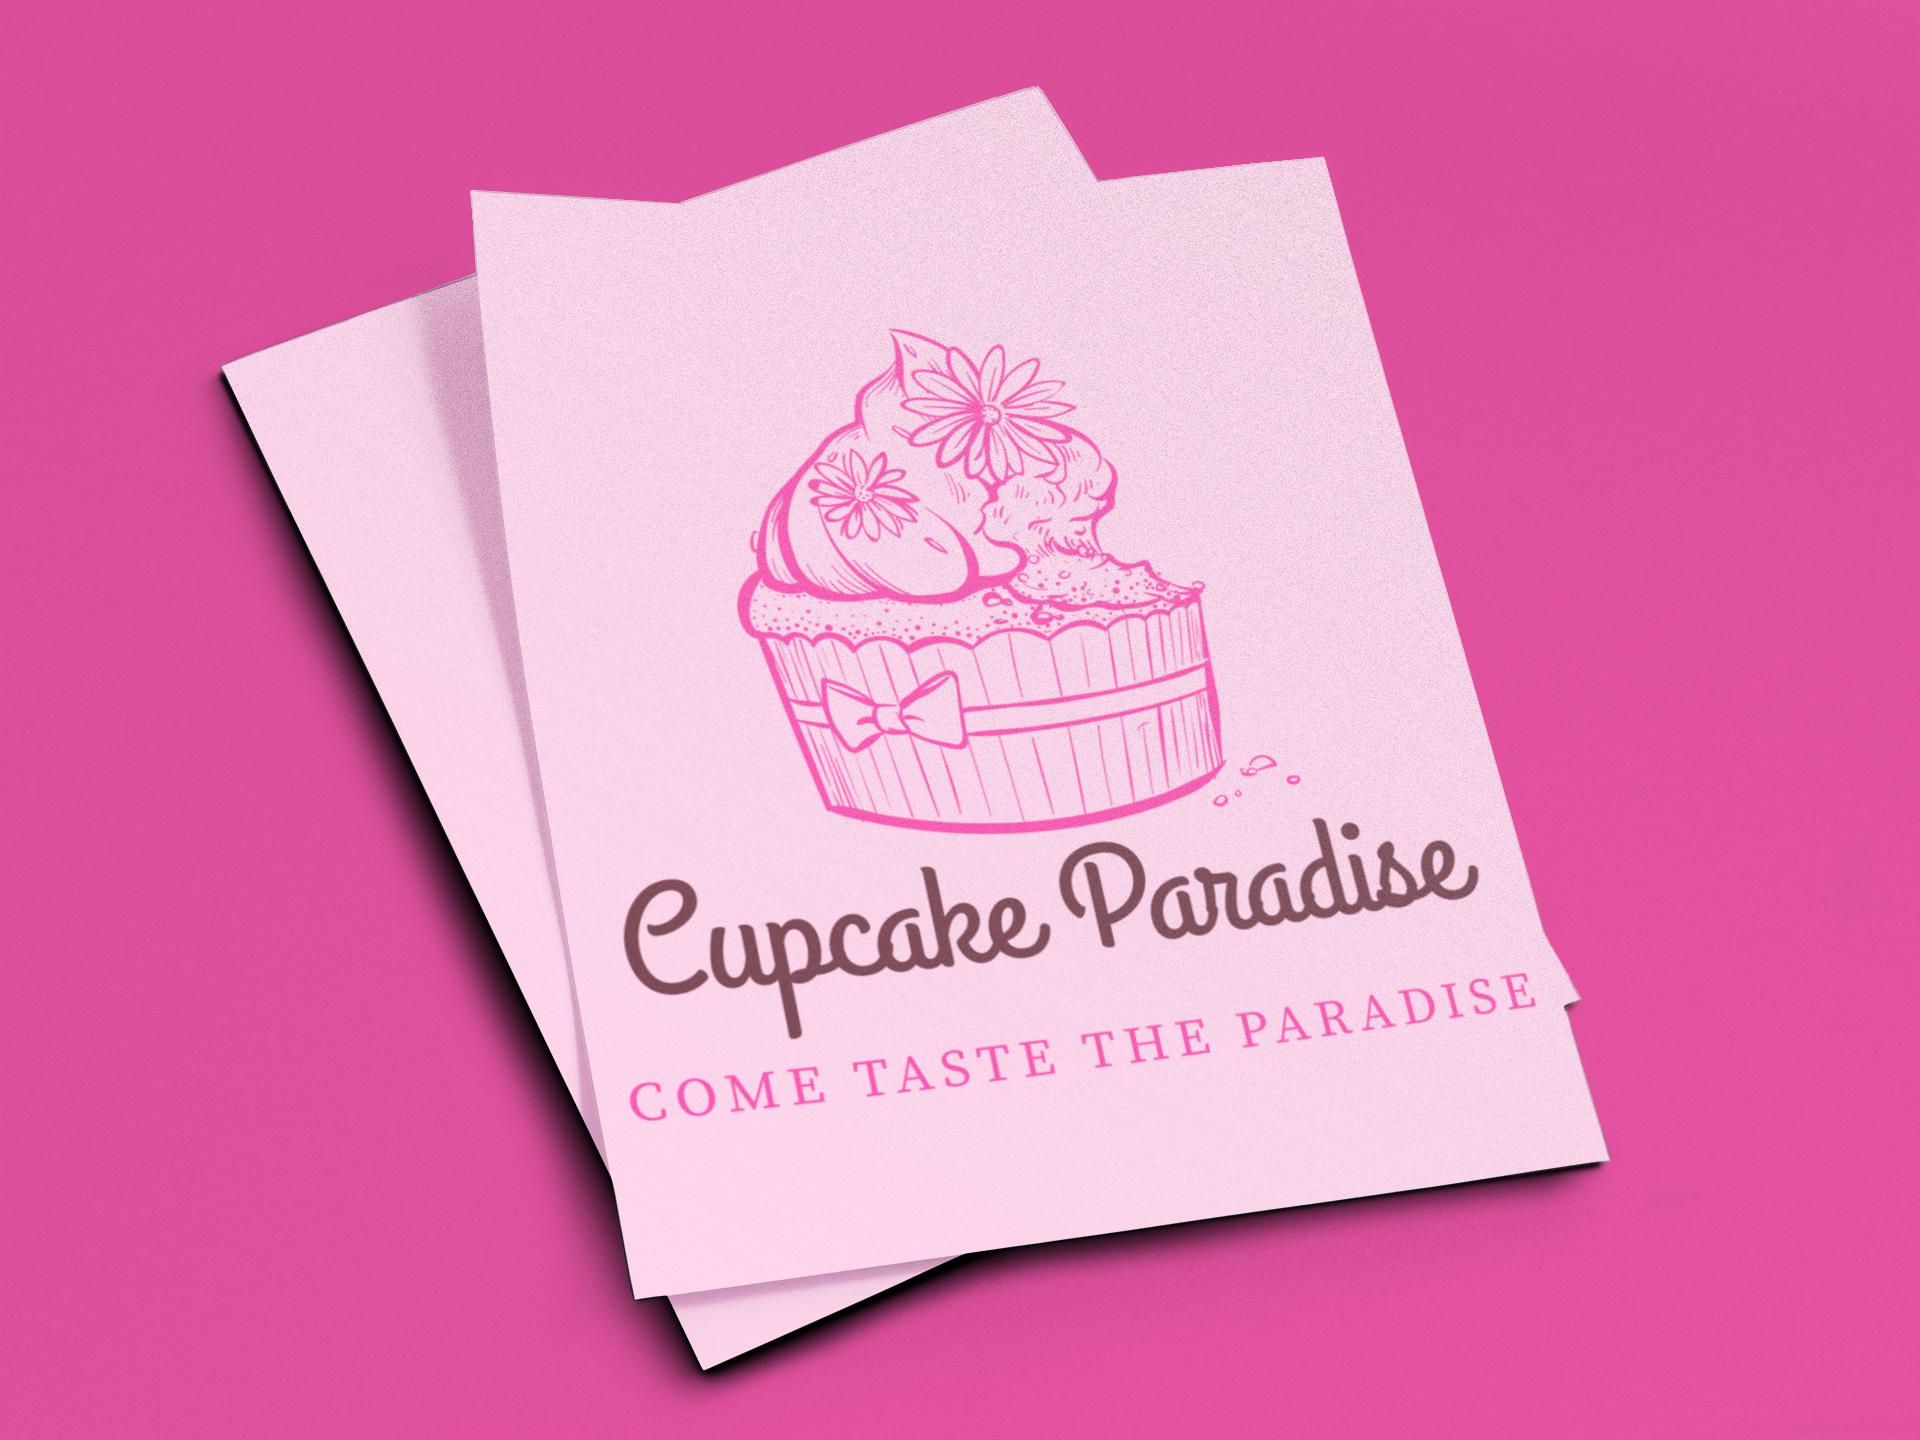 Cupcake Paradise.